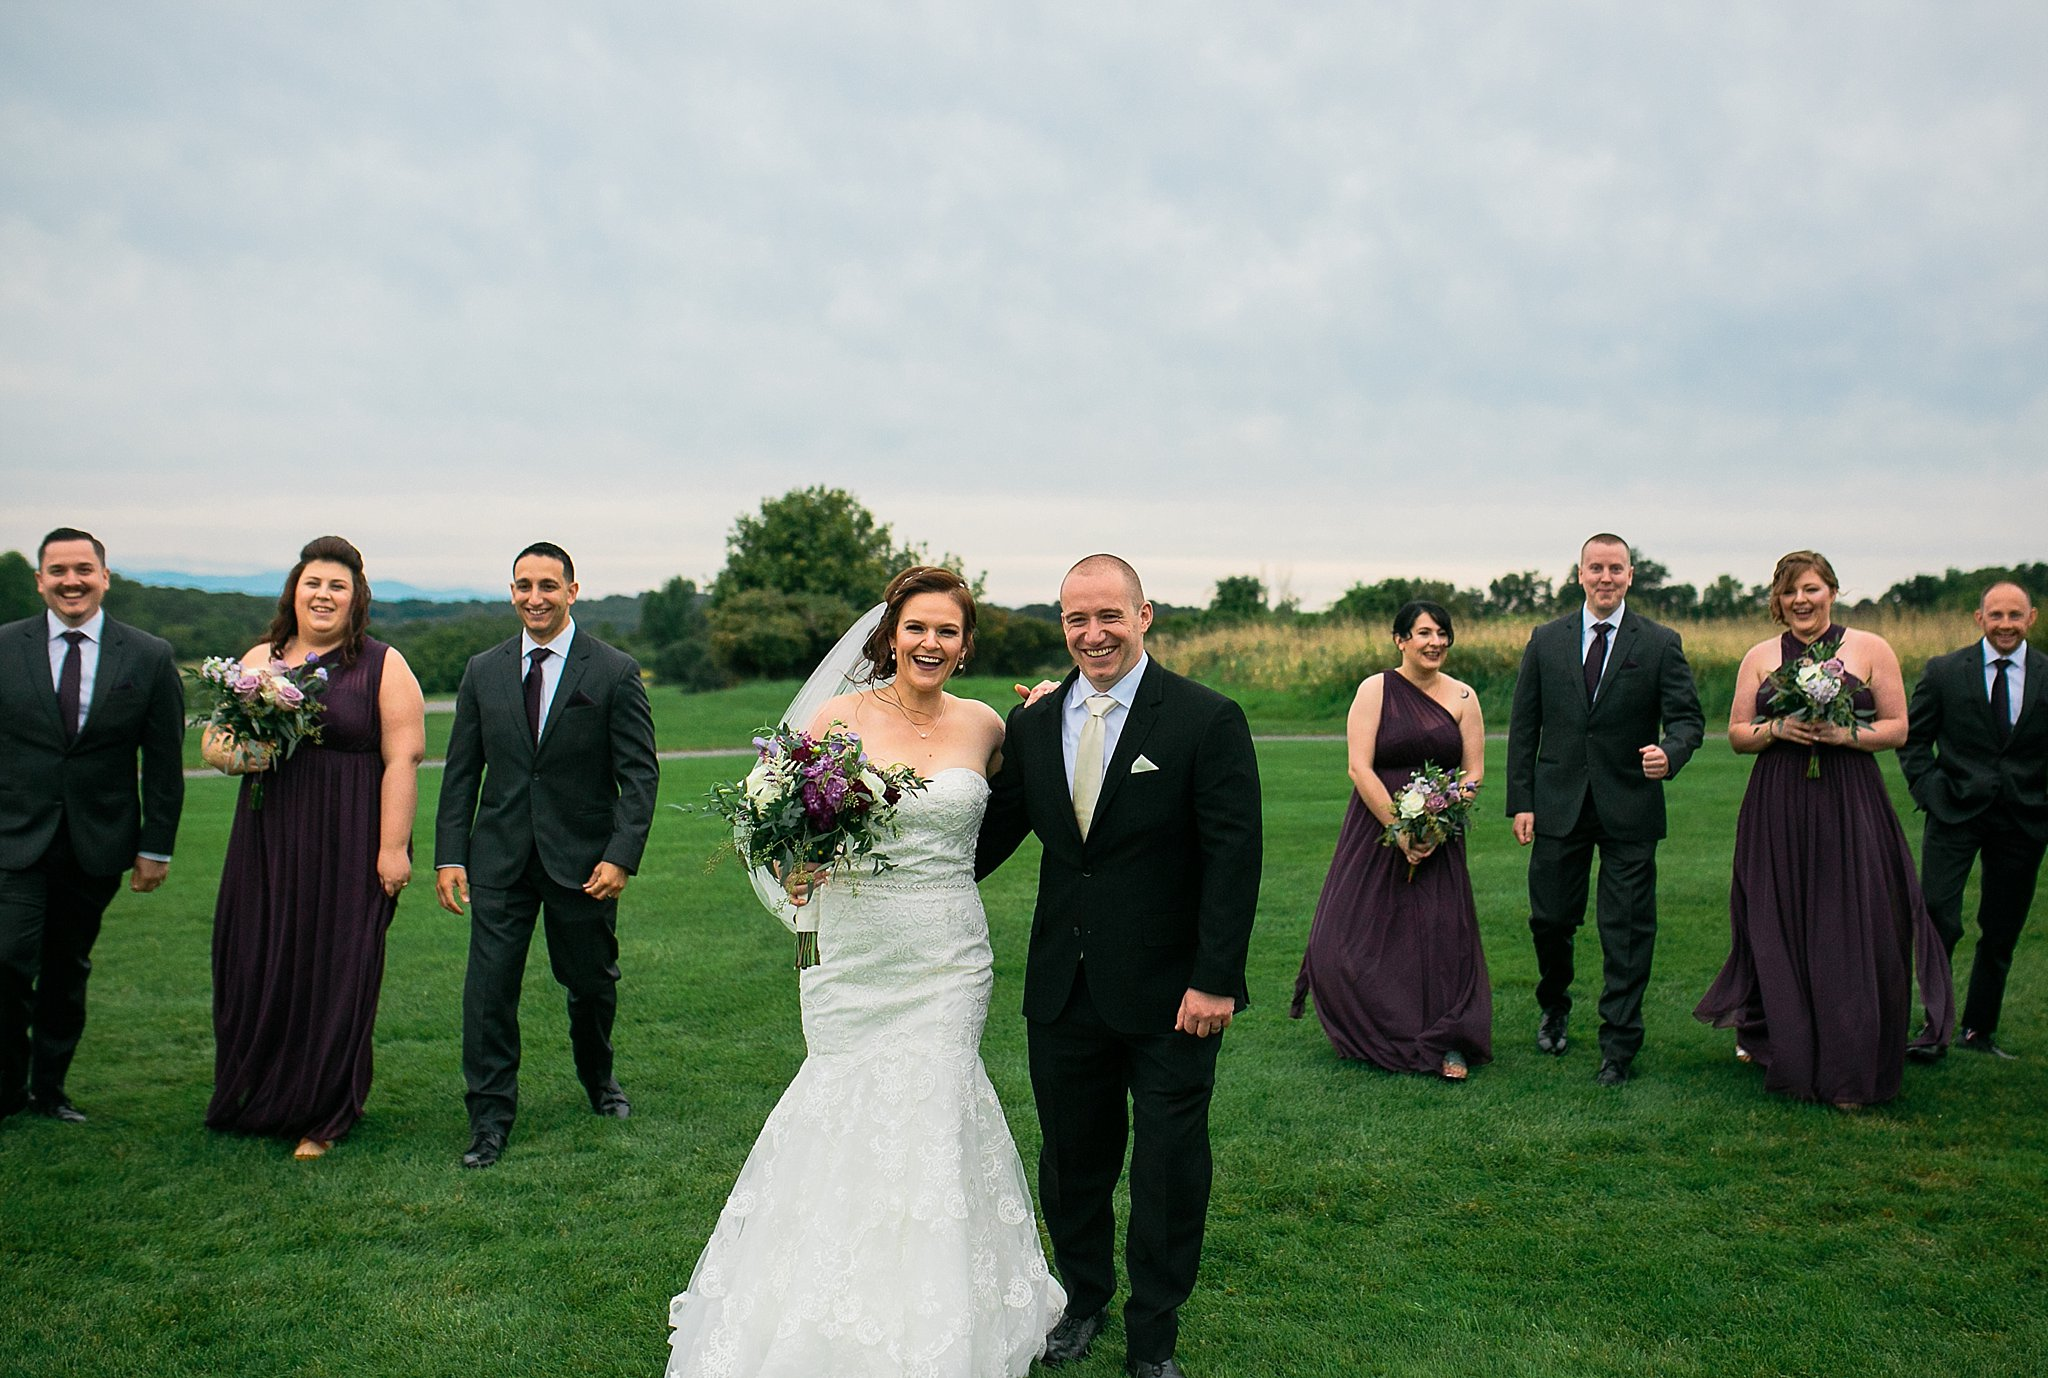 Links at Unionvale Wedding Lagrangeville Wedding Hudson Valley Wedding Photographer Sweet Alice Photography45.jpg